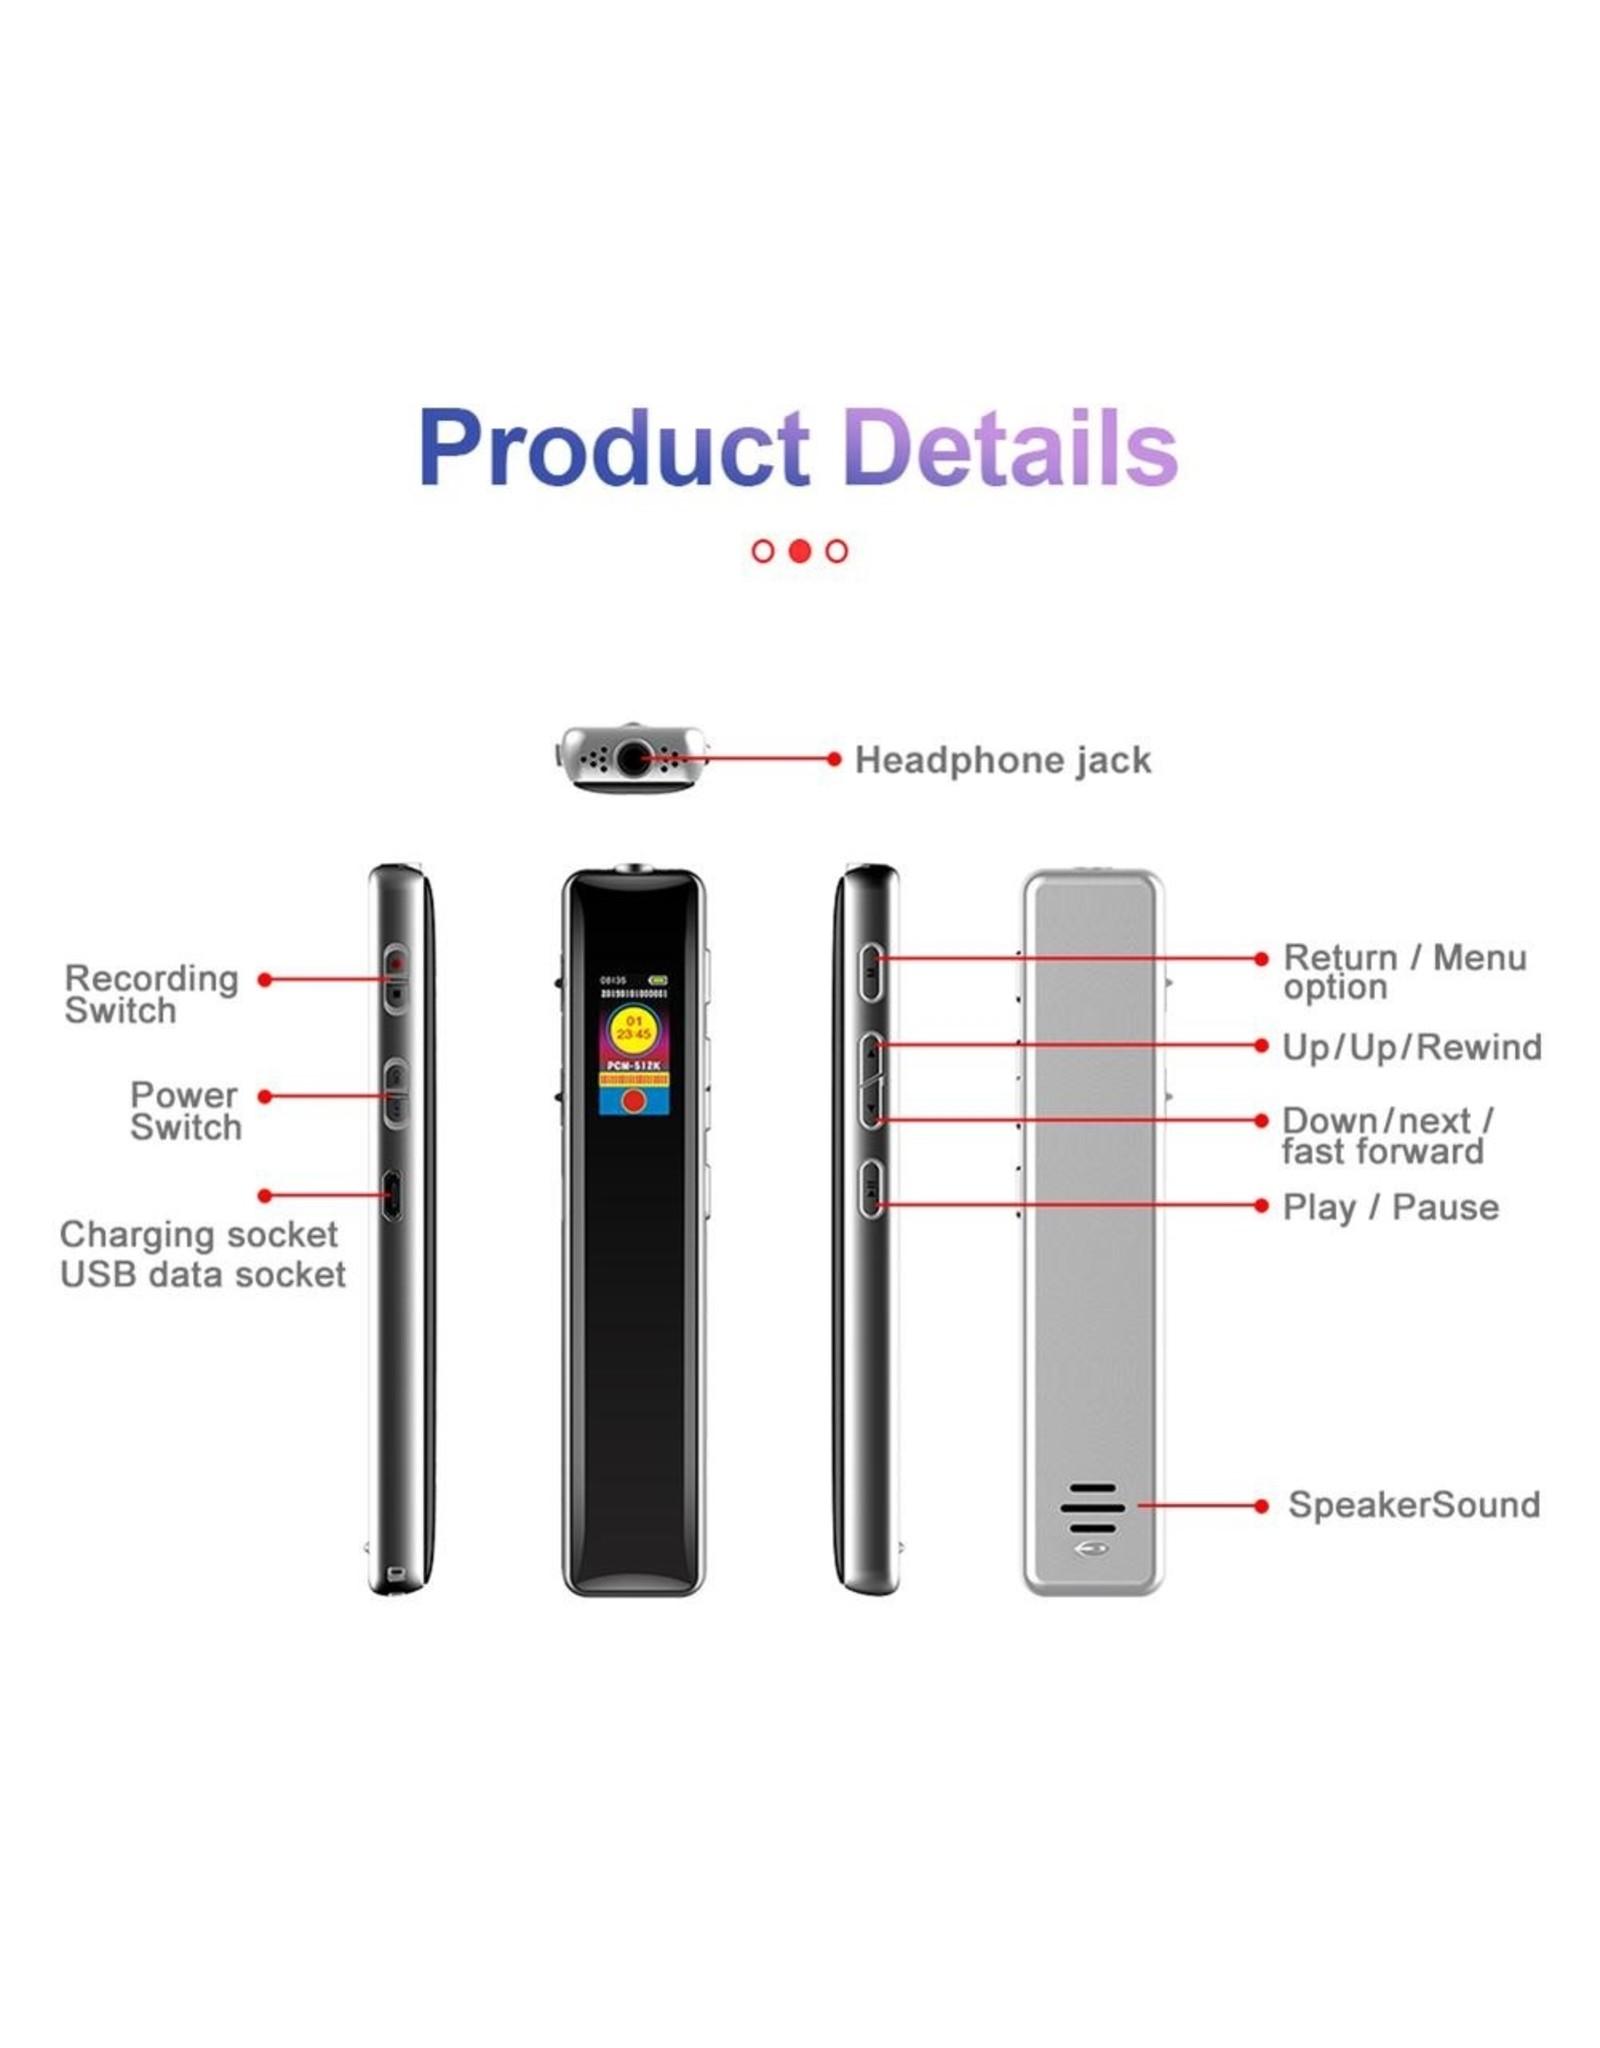 Premium Digitale Recorder - Premium Voice Recorder - Multifunctionele Voice Recorder - Dictafoon 4 GB - Audio Memo Recorder Met USB - Spraak Recorder - Sound – Geluid Recorder - Opname Apparaat - Met MP3 Speler Functie